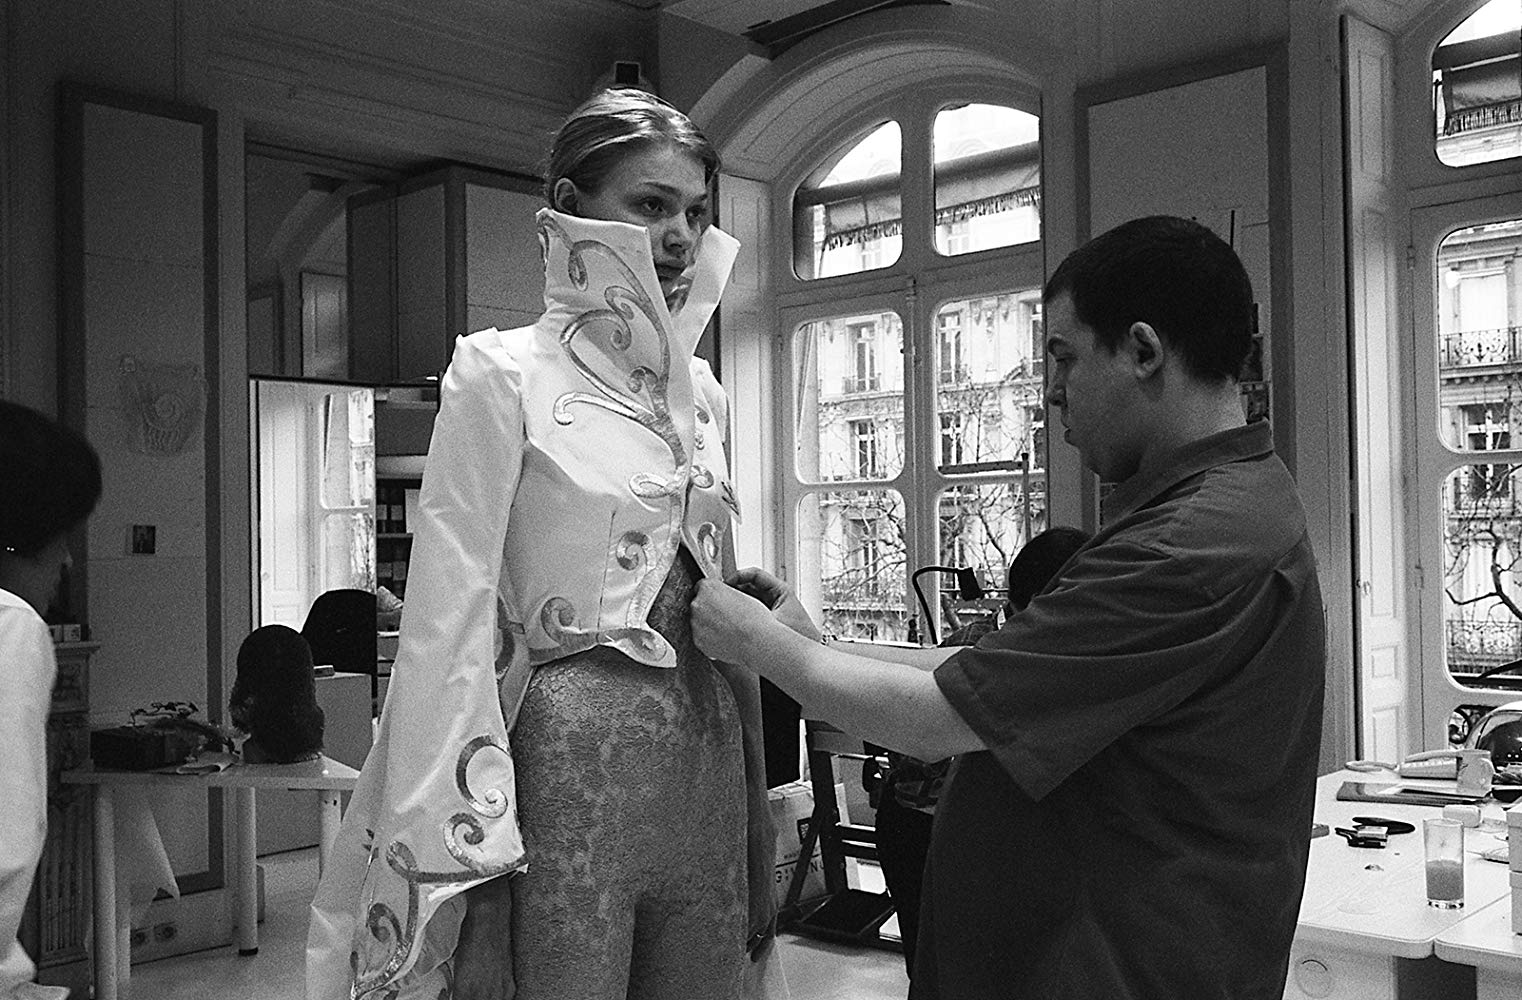 Alexander McQueen - Il genio della moda: Alexander McQueen in una scena del documentario